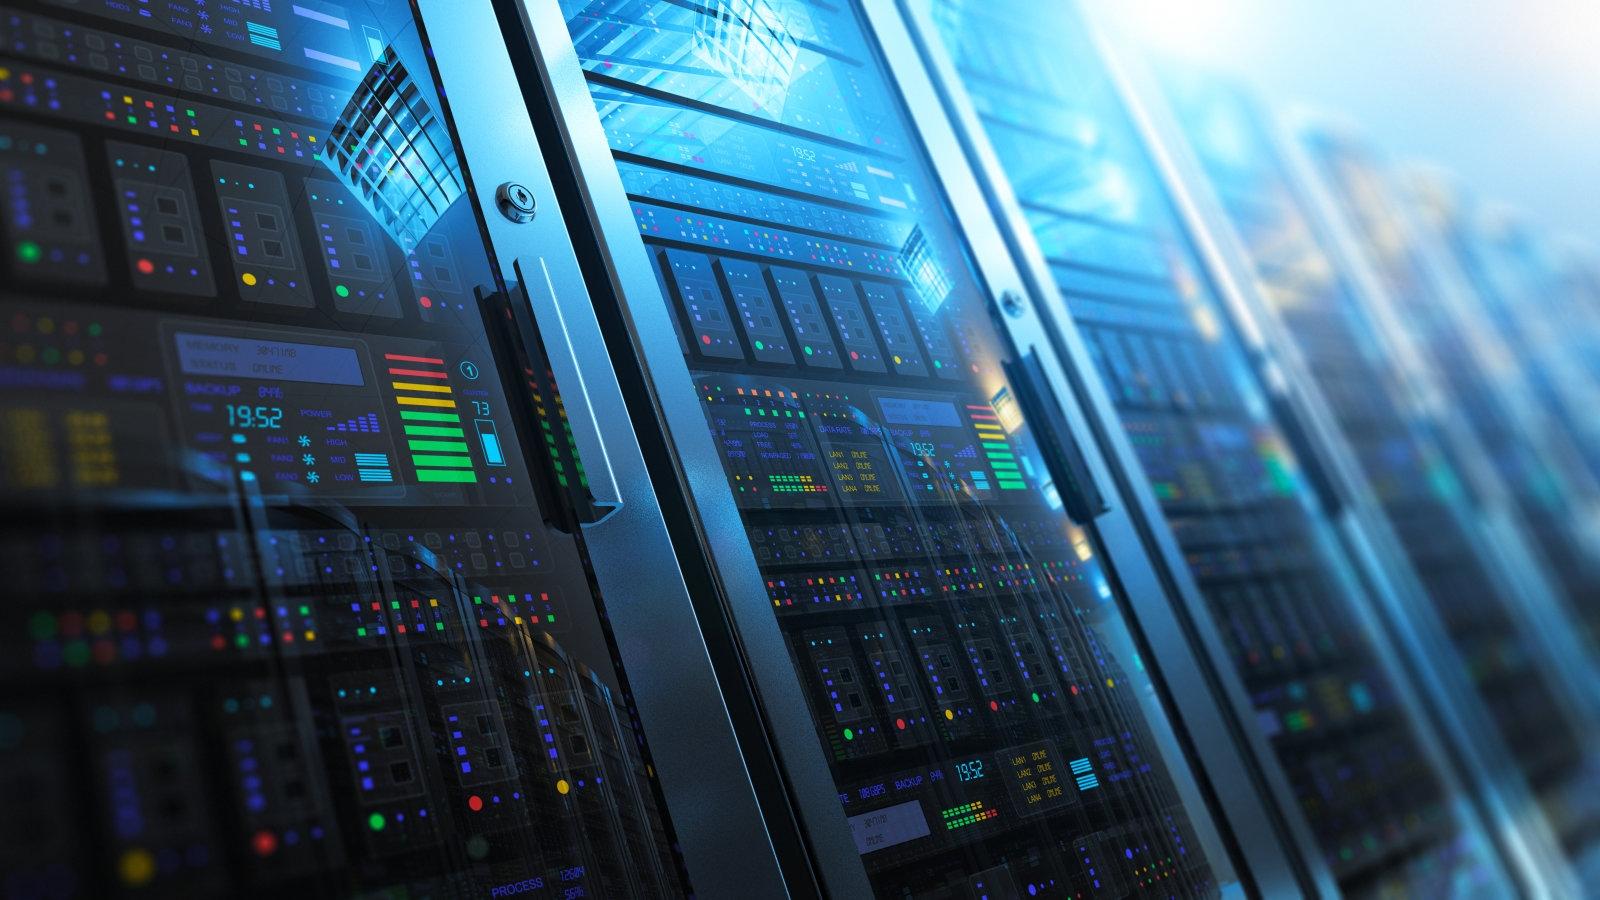 NordVPN strengthens security measures following server breach   DeviceDaily.com